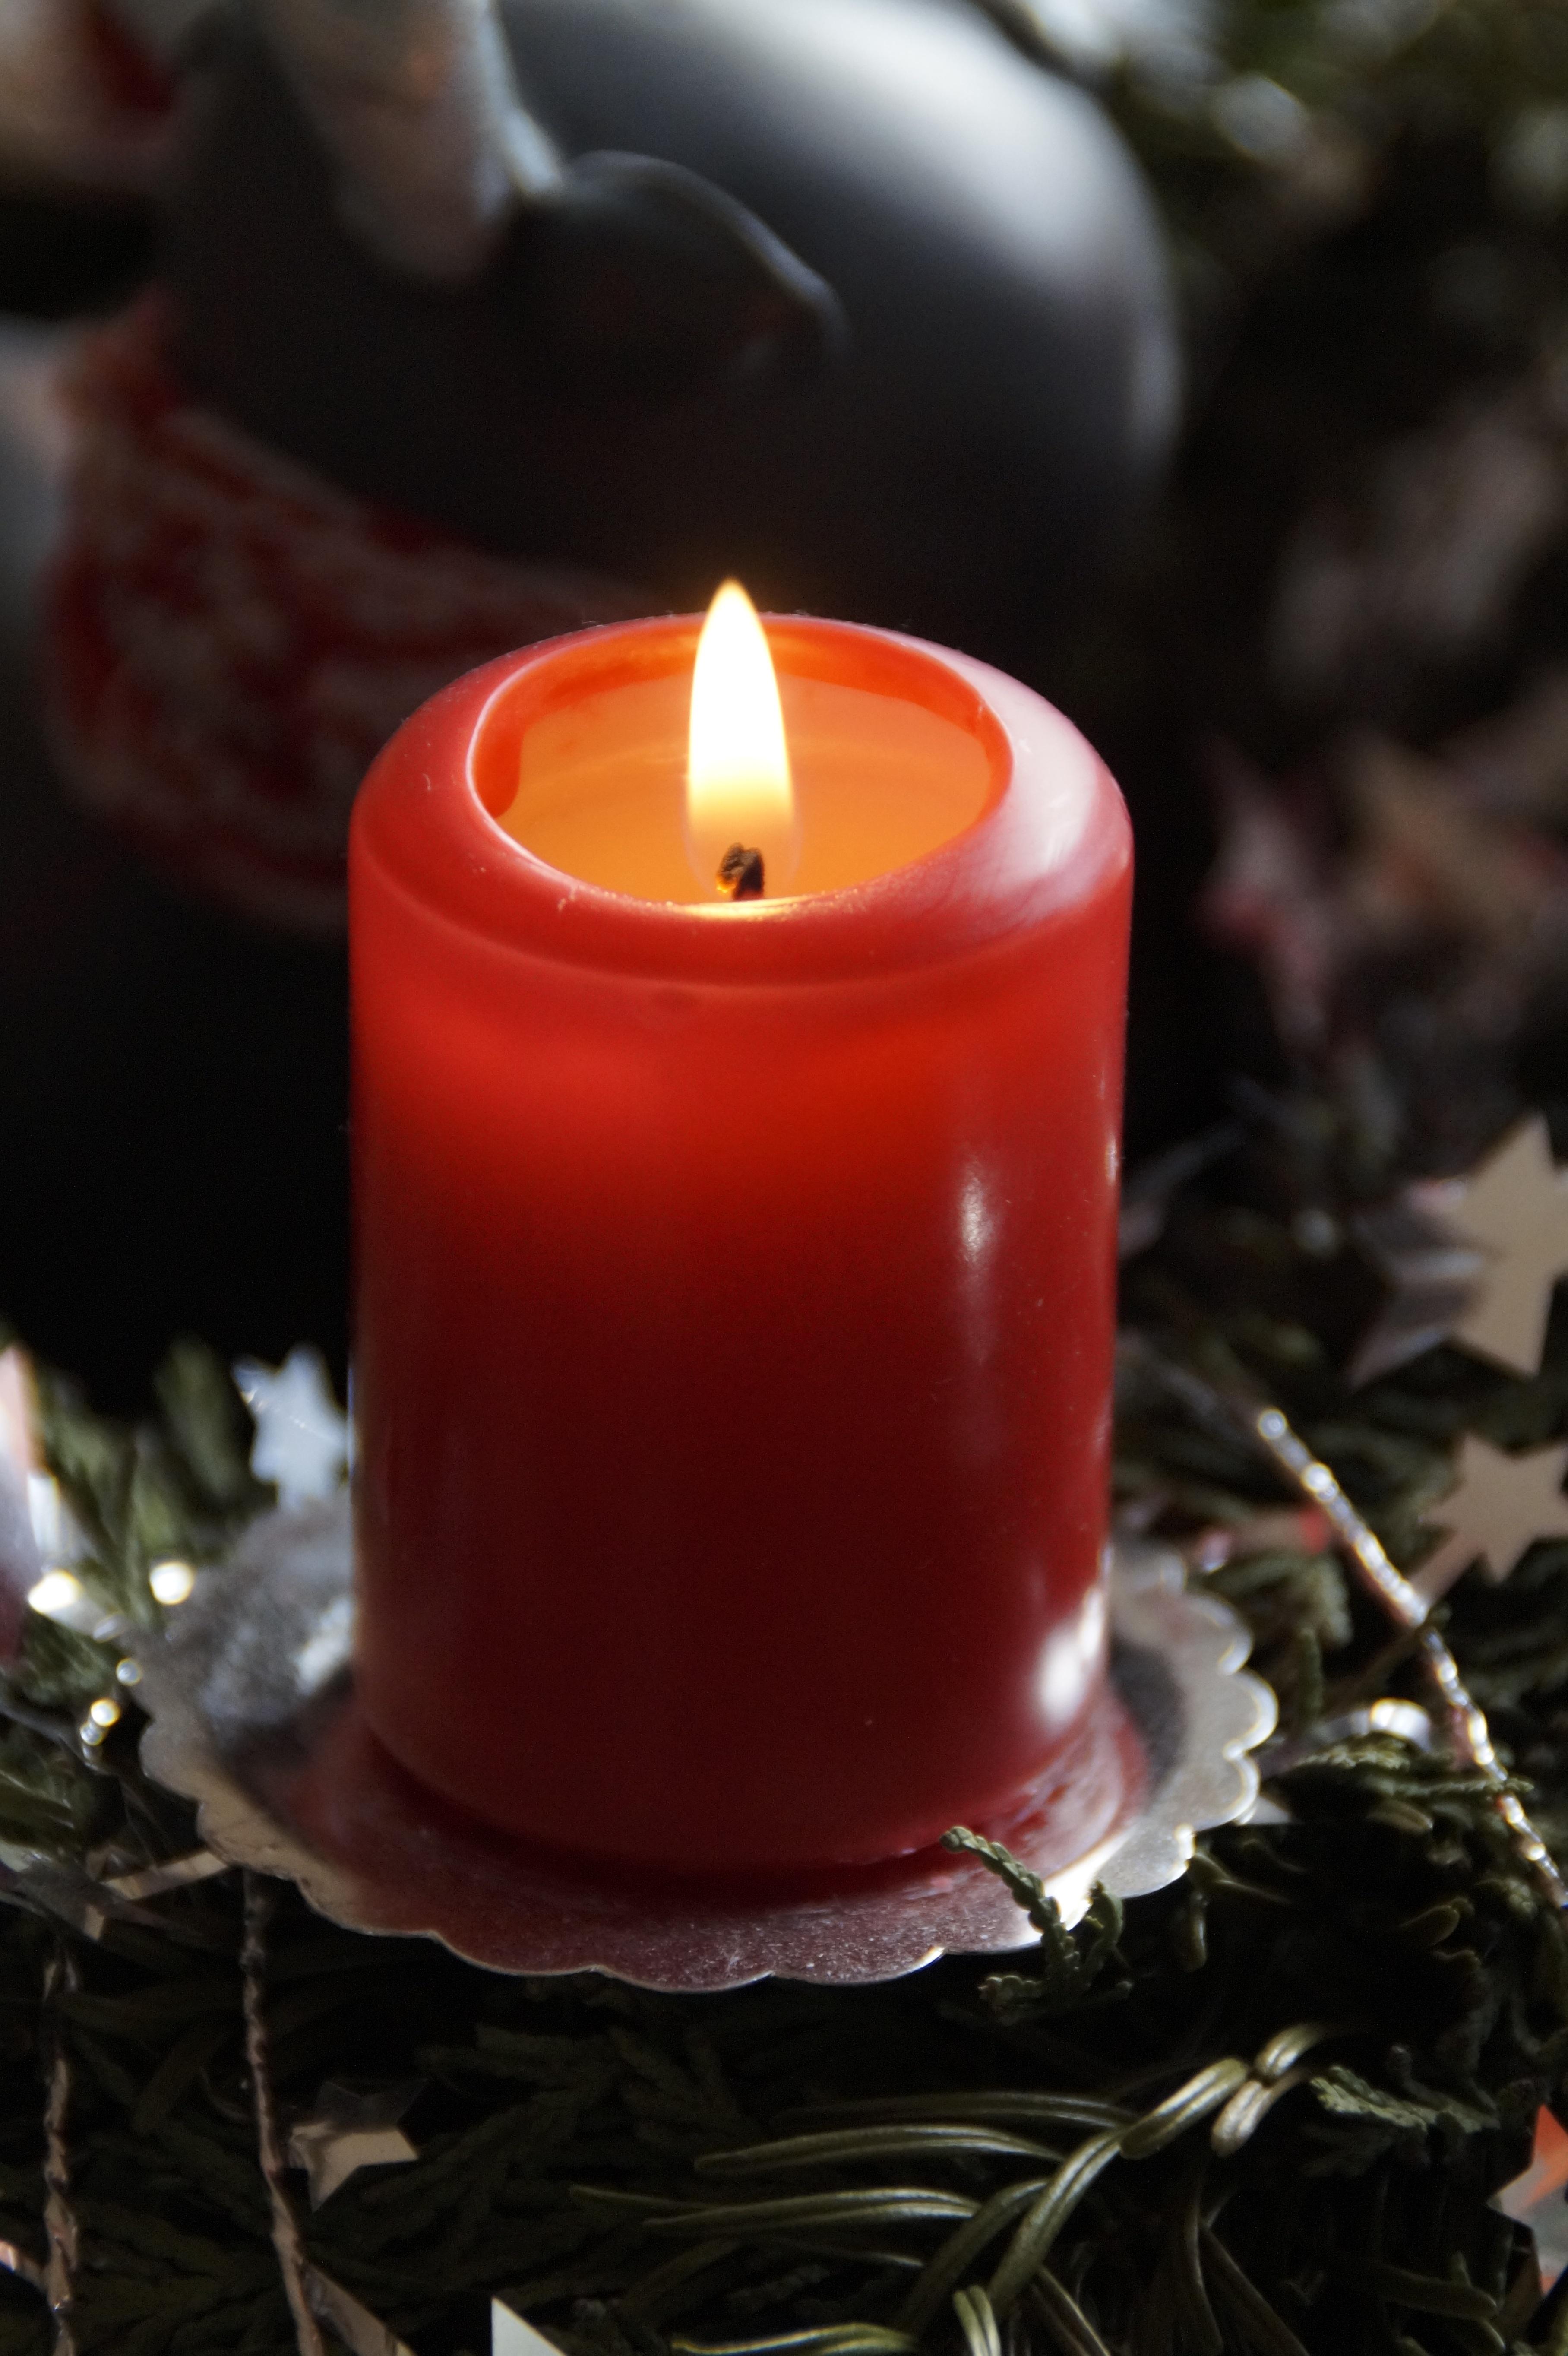 kostenlose foto winter licht blume rot flamme kerze. Black Bedroom Furniture Sets. Home Design Ideas